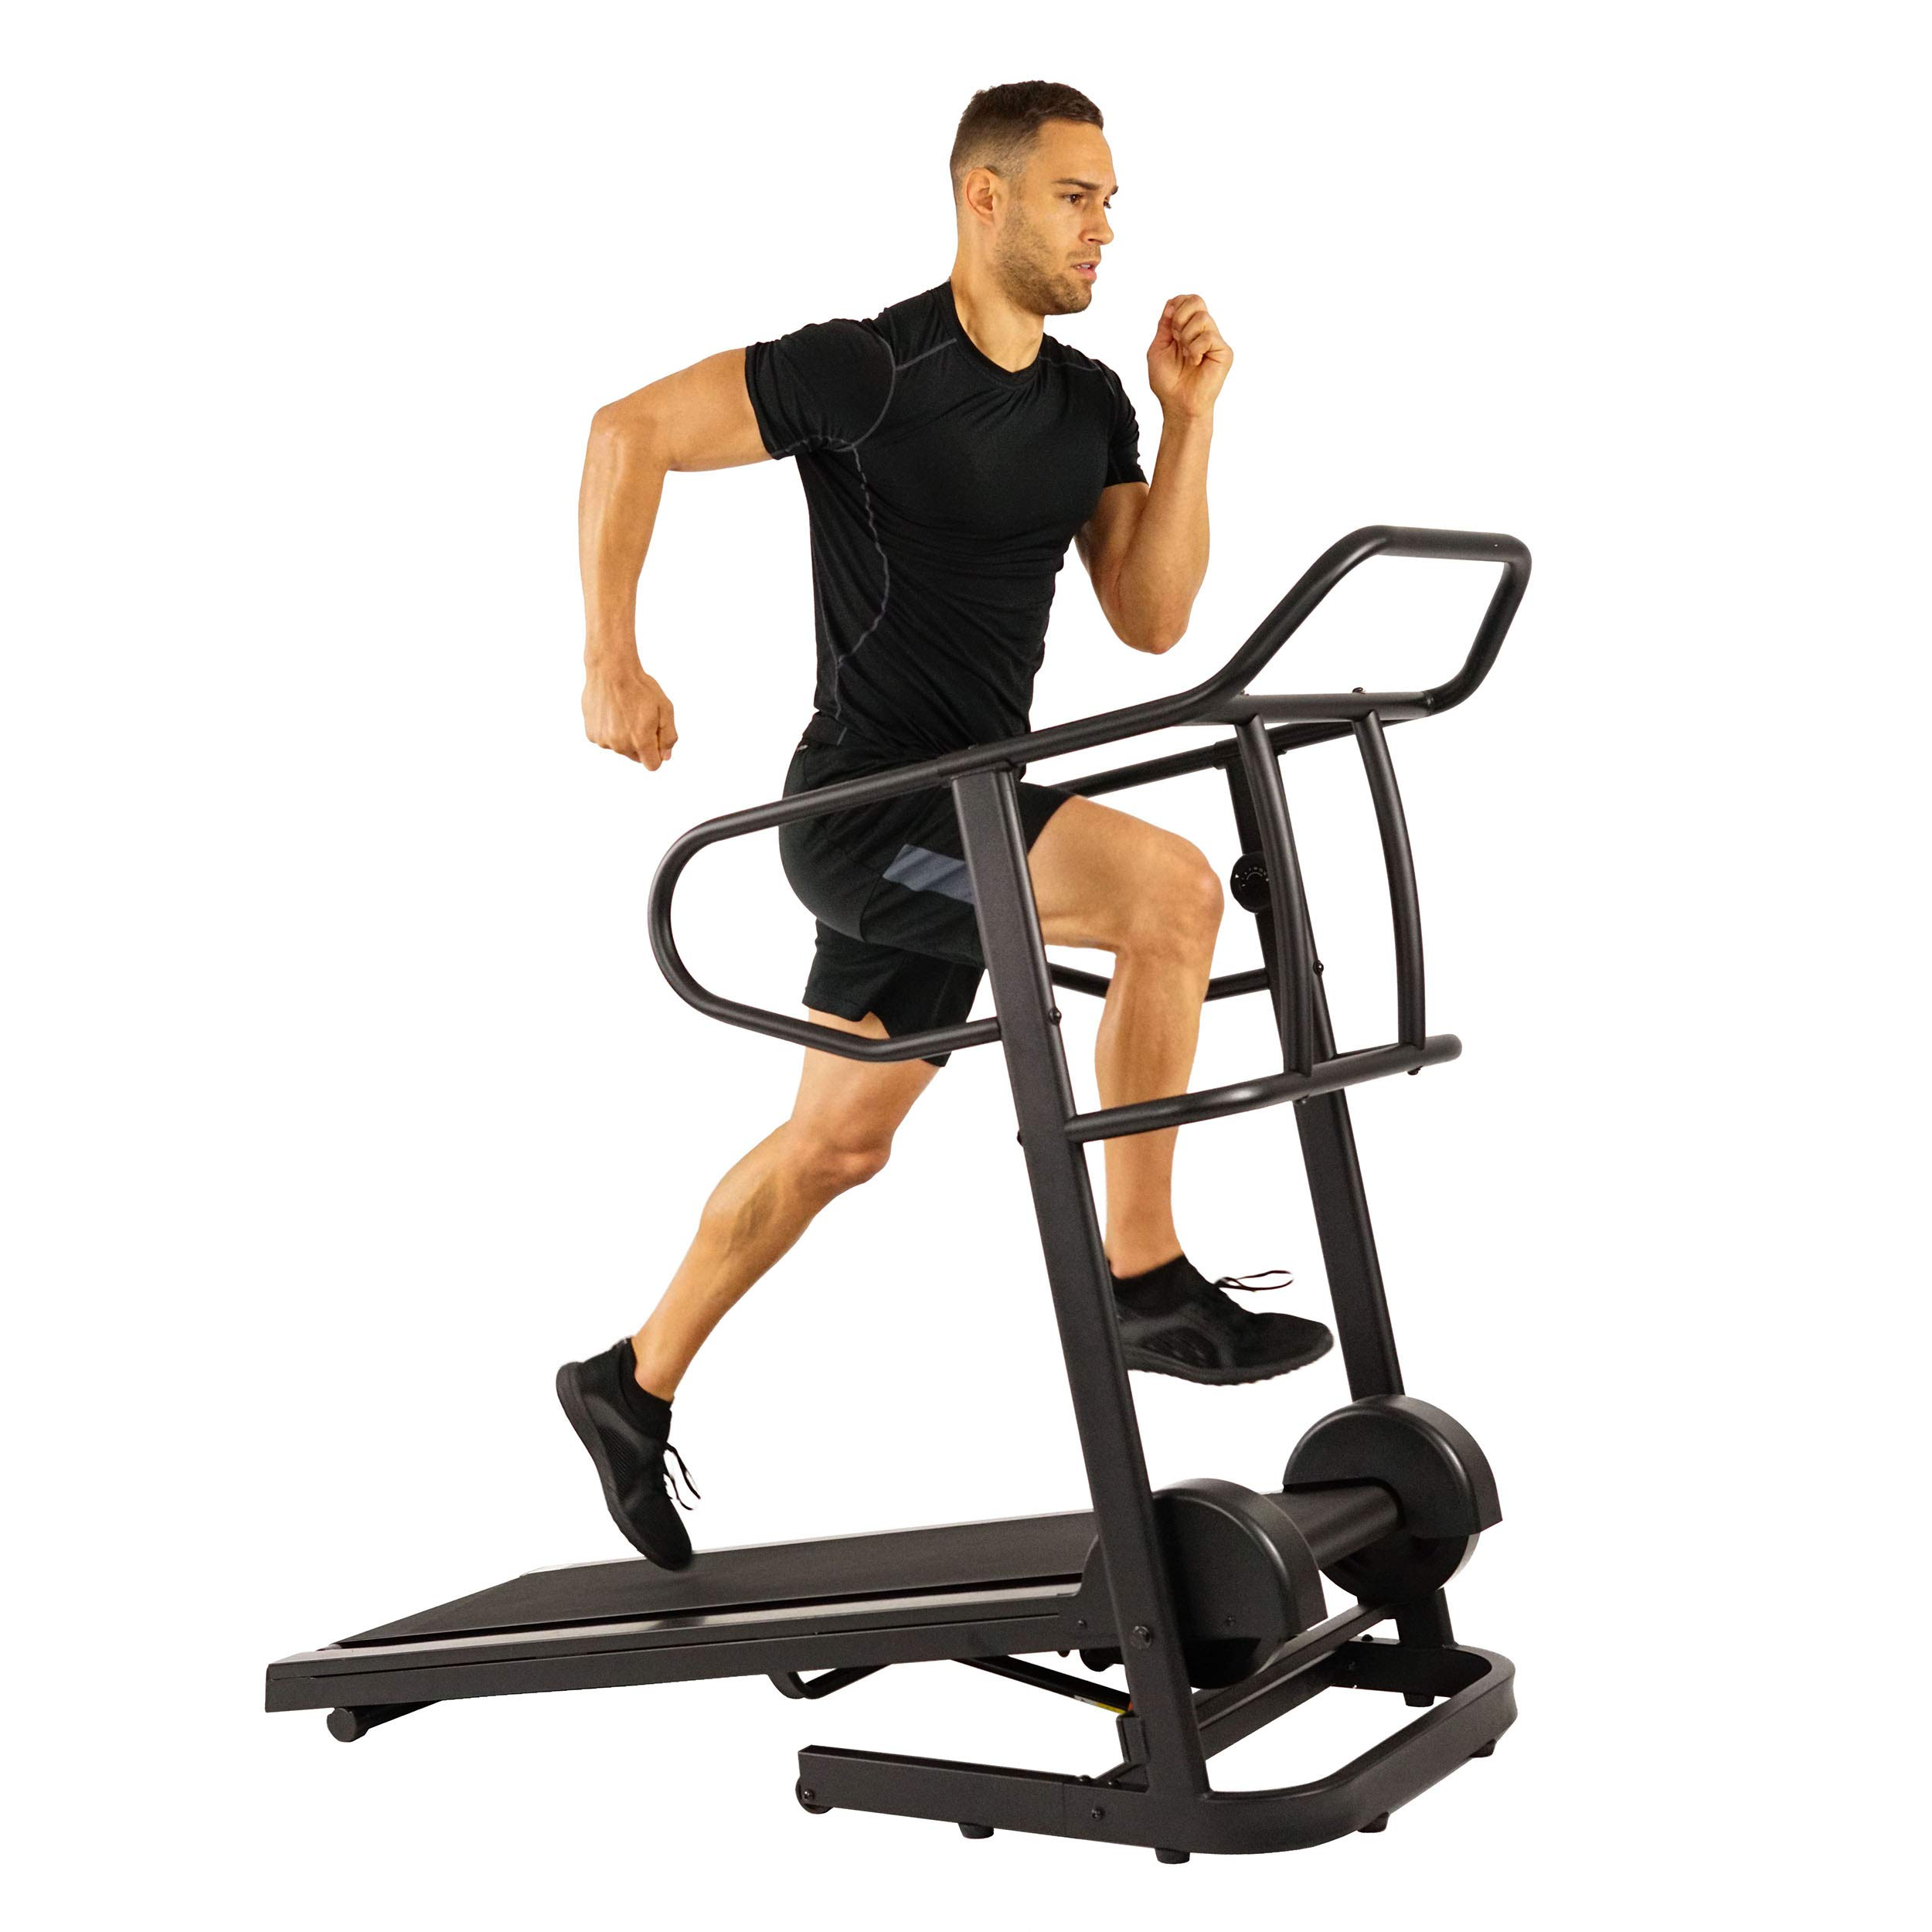 Sunny Health Fitness Treadmill Resistance